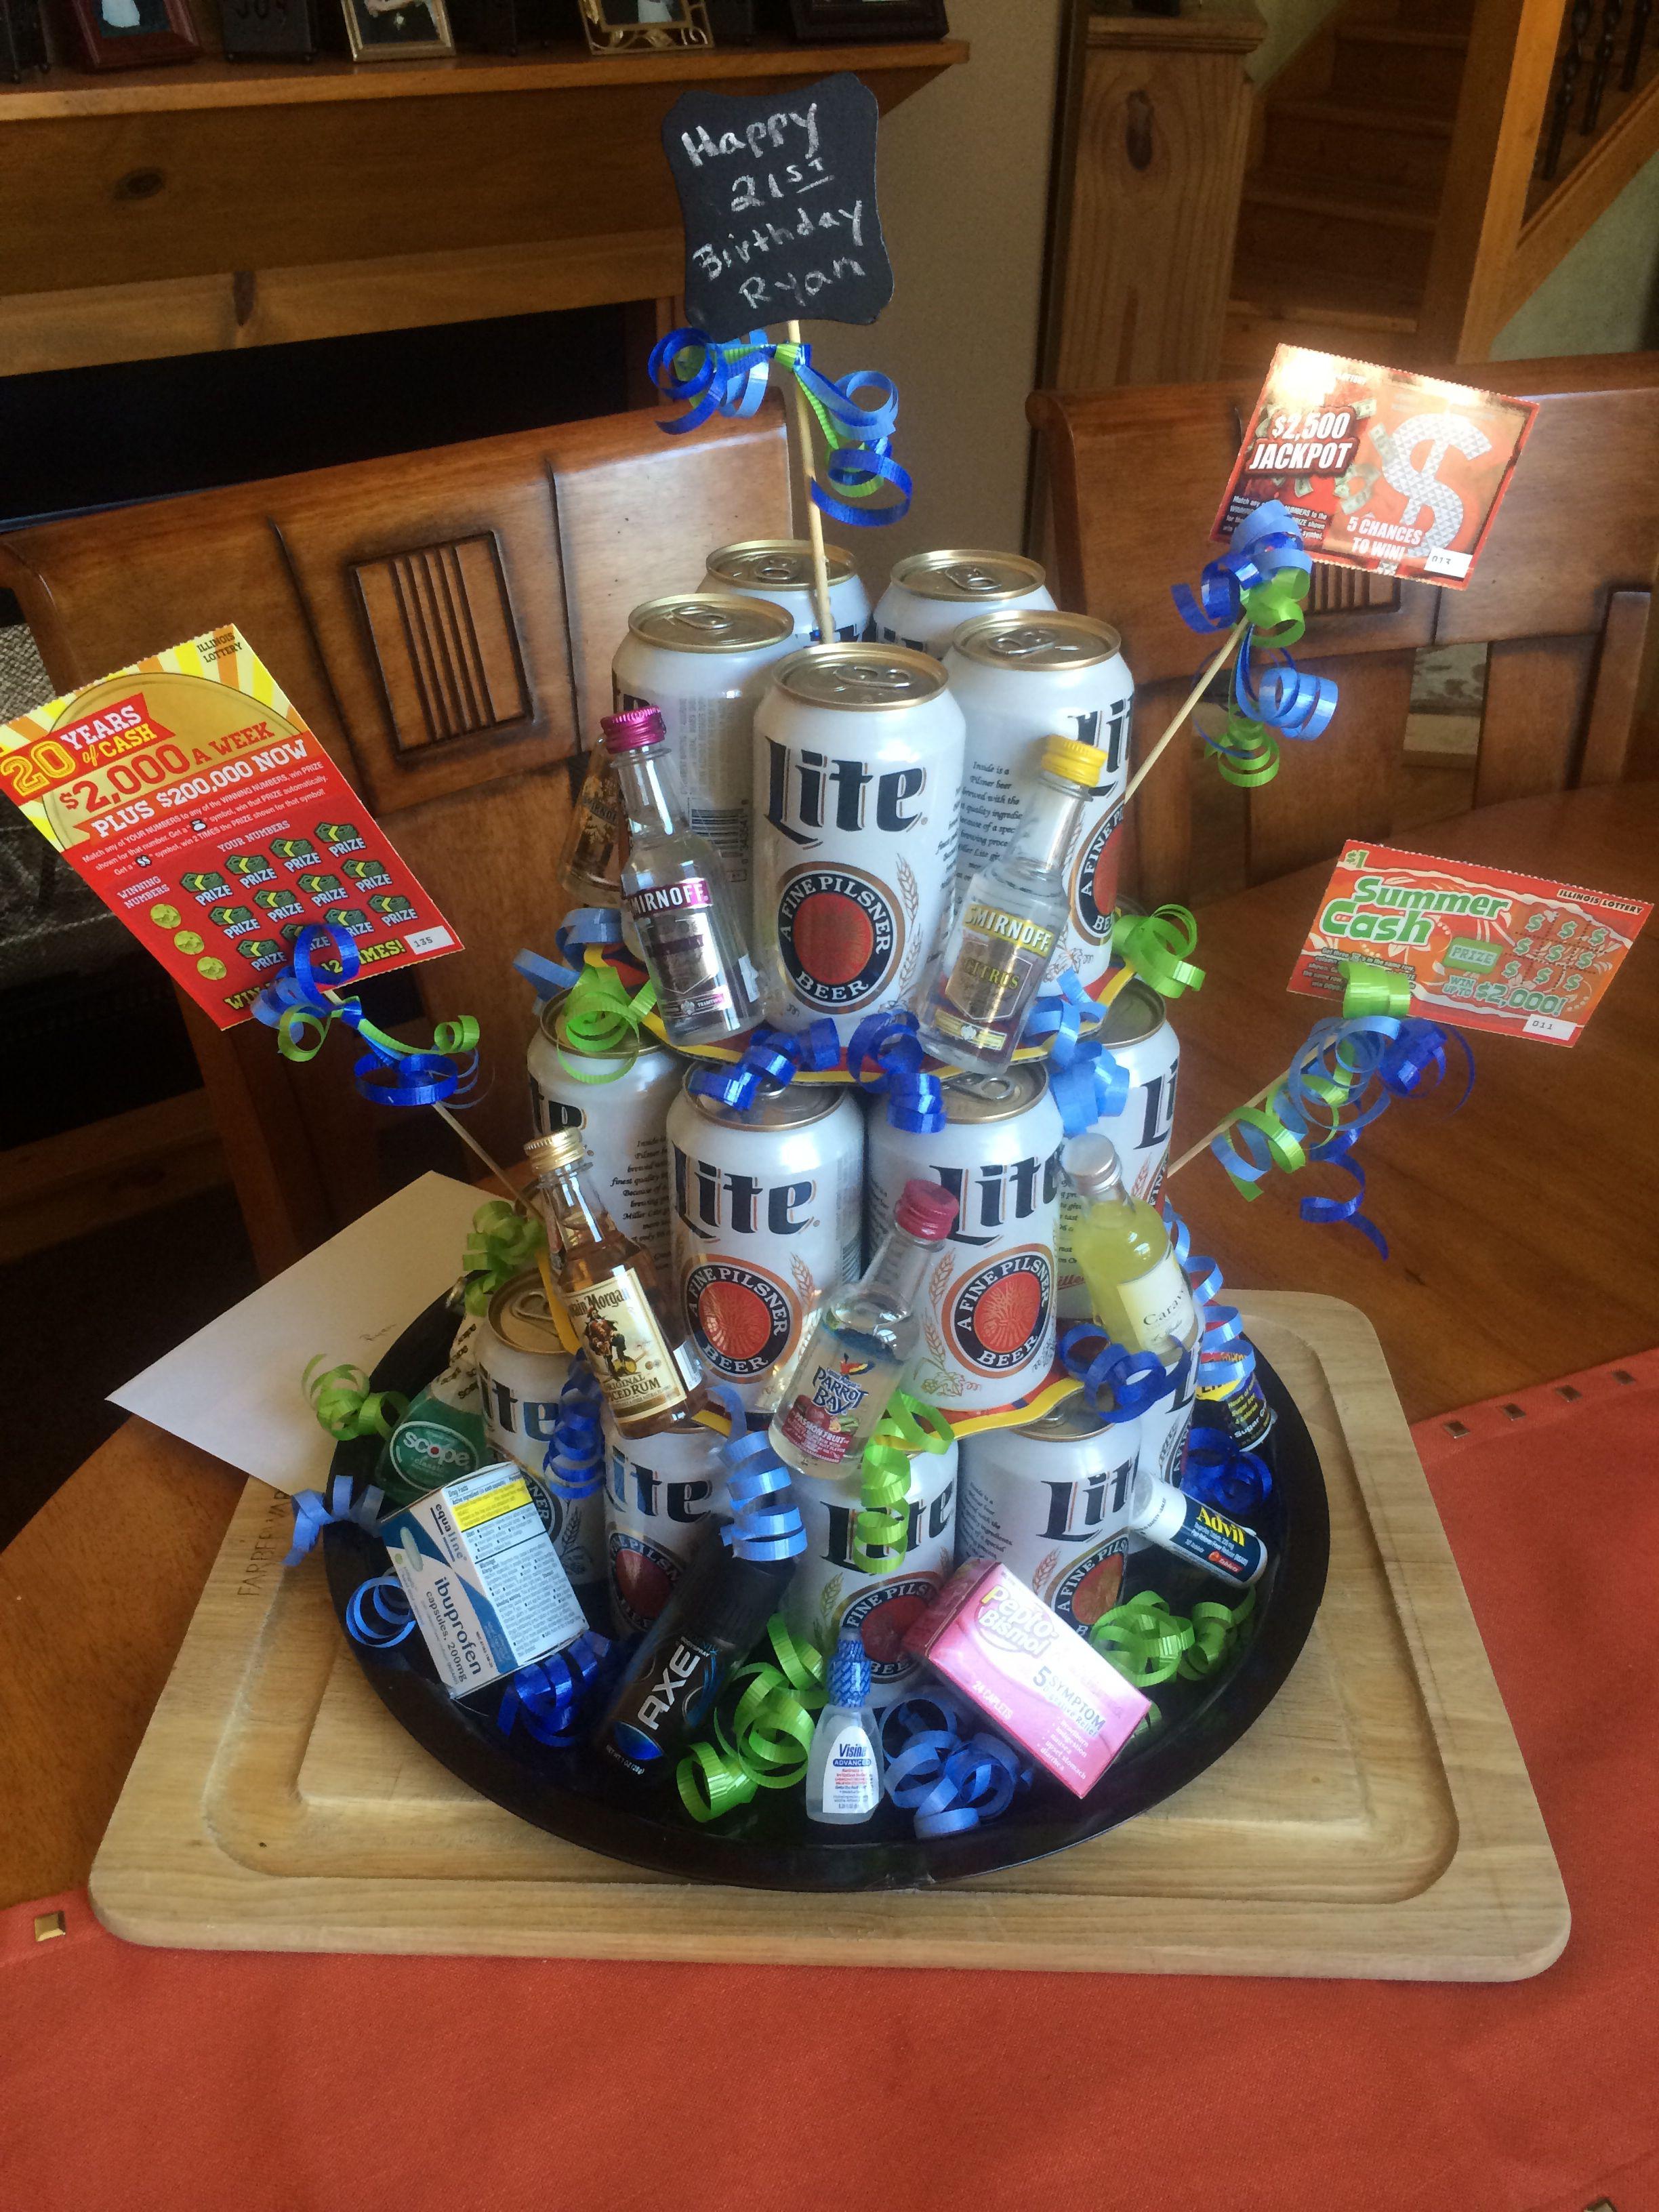 21st Birthday Gift Beer Cake Tower Birthday Present Diy